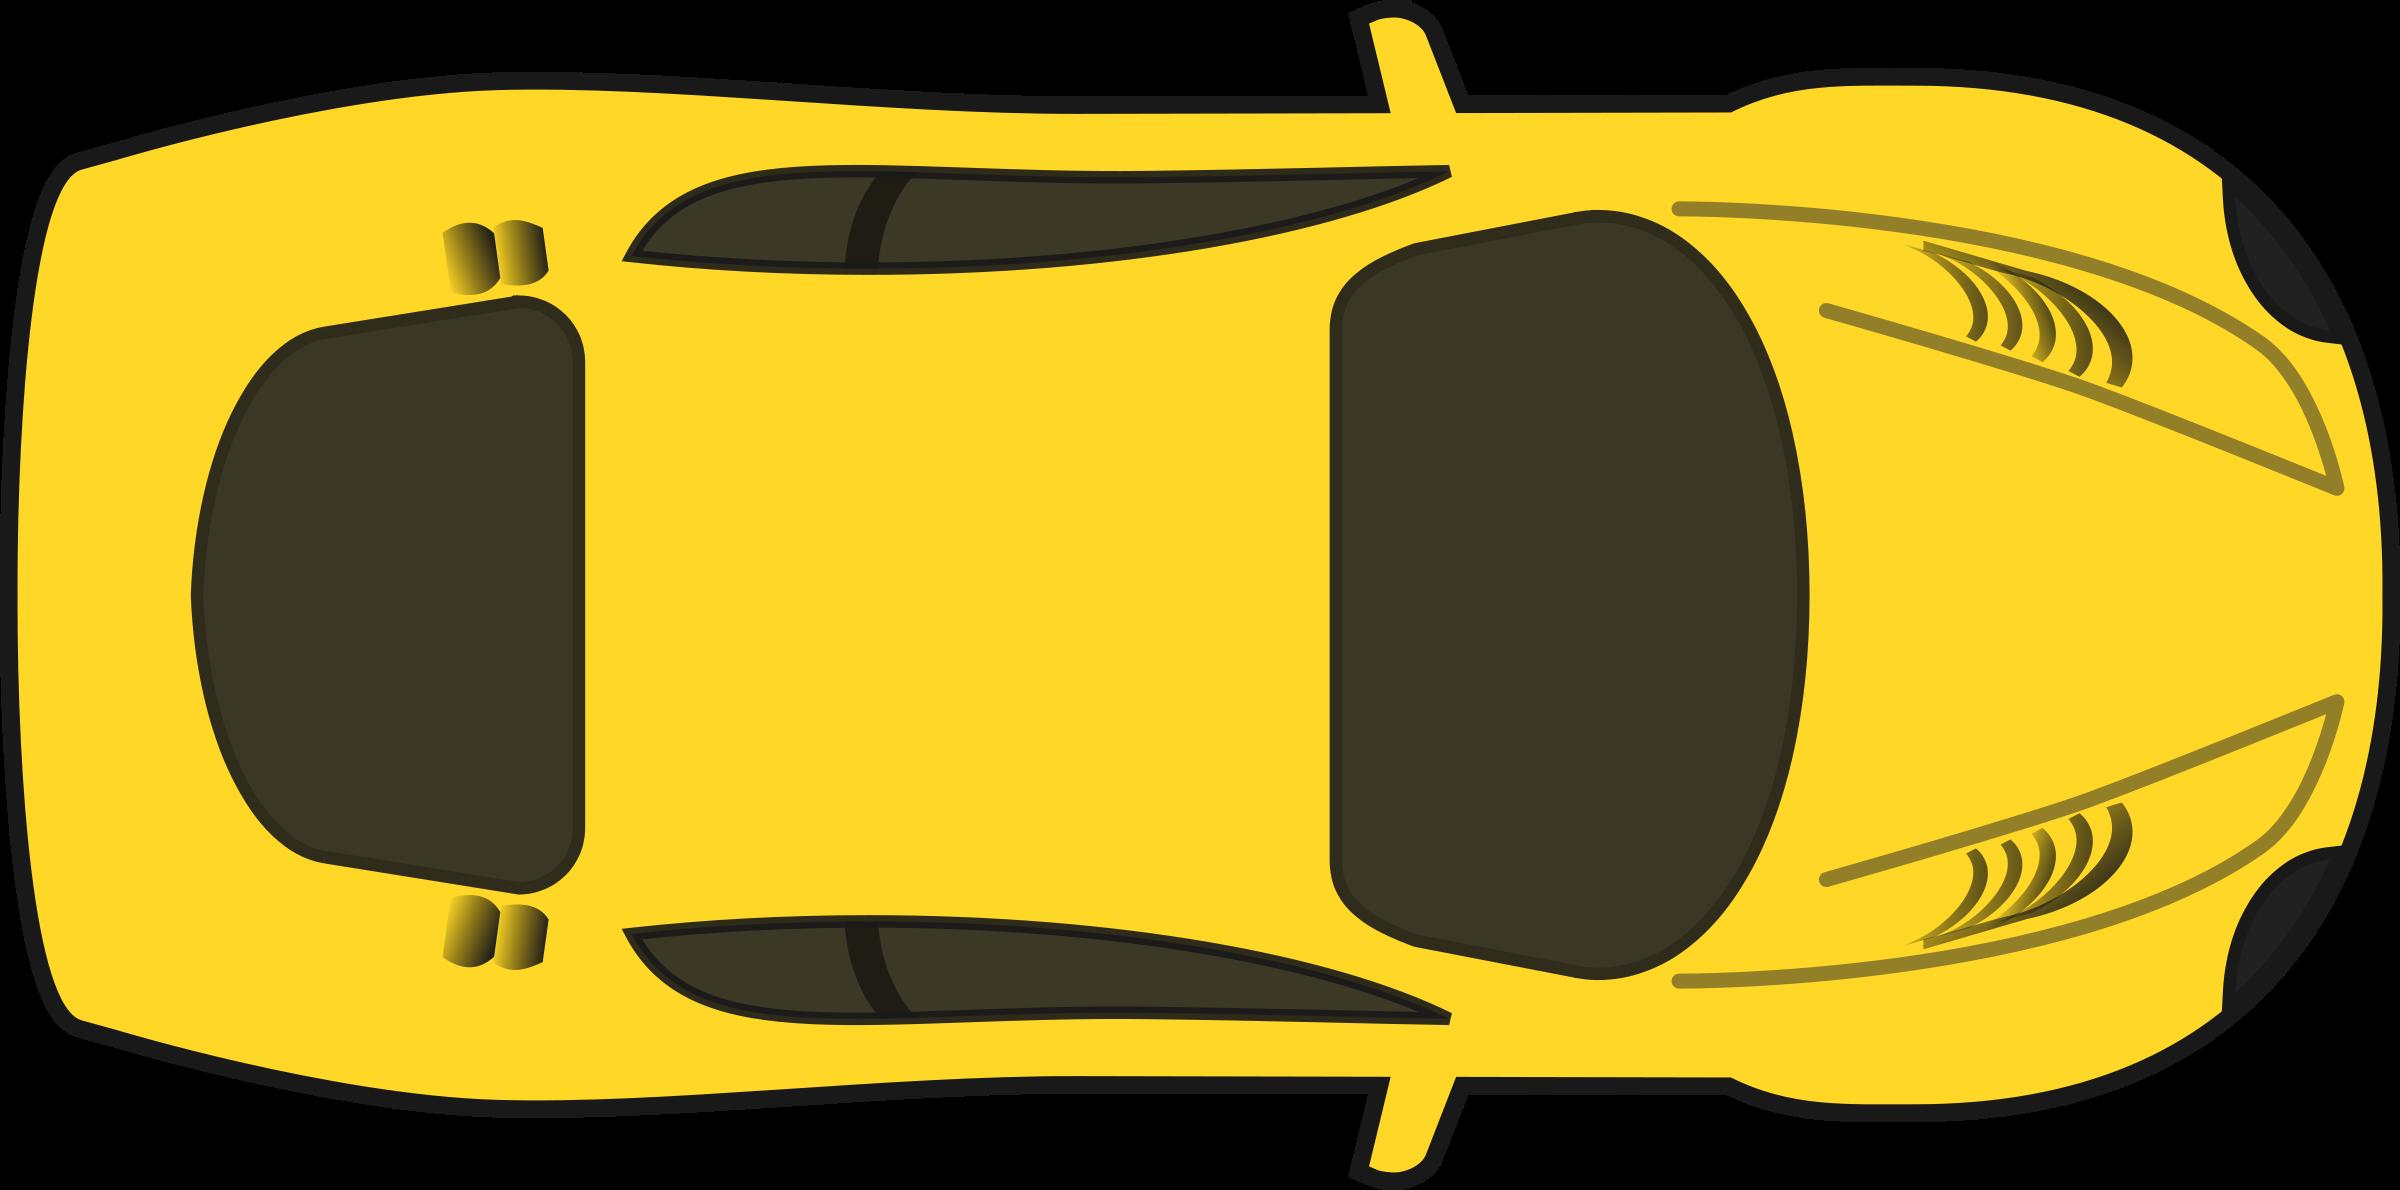 Best Car Clipart Top View #28640.